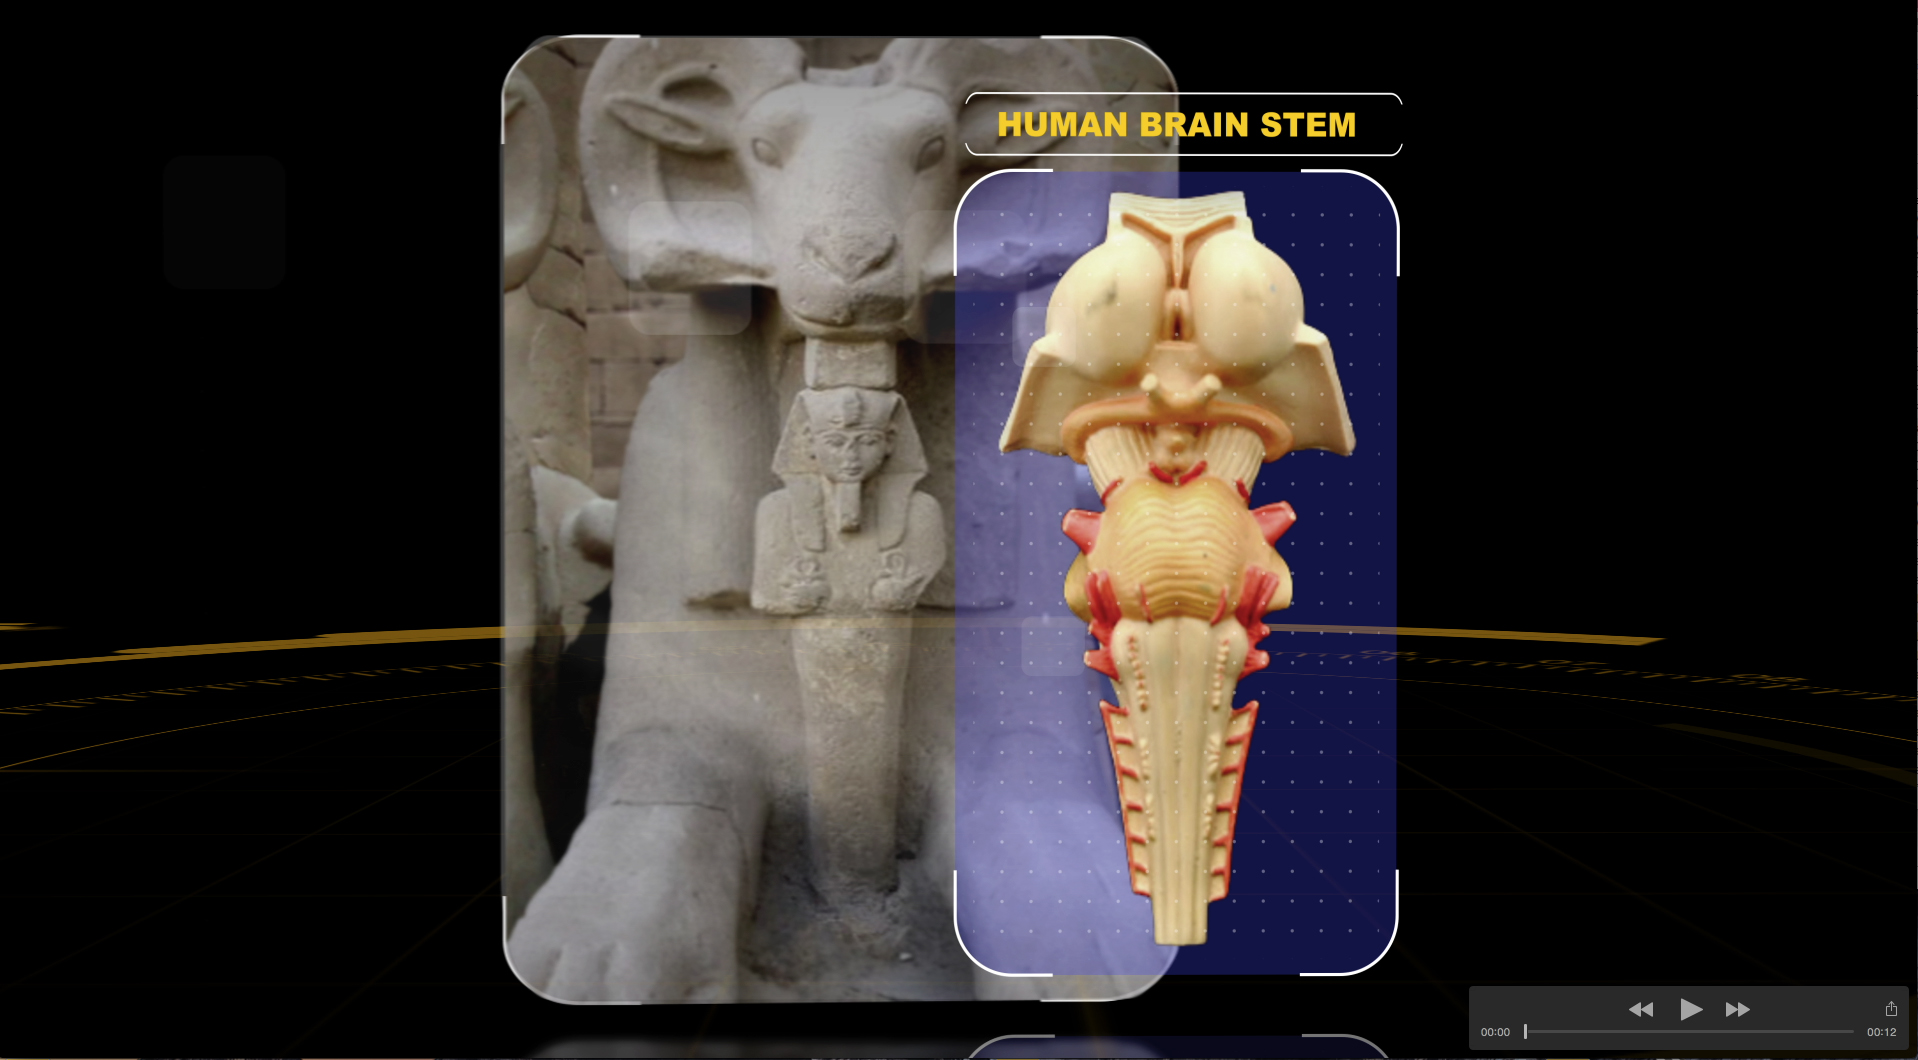 brain stem ram comparison.jpg